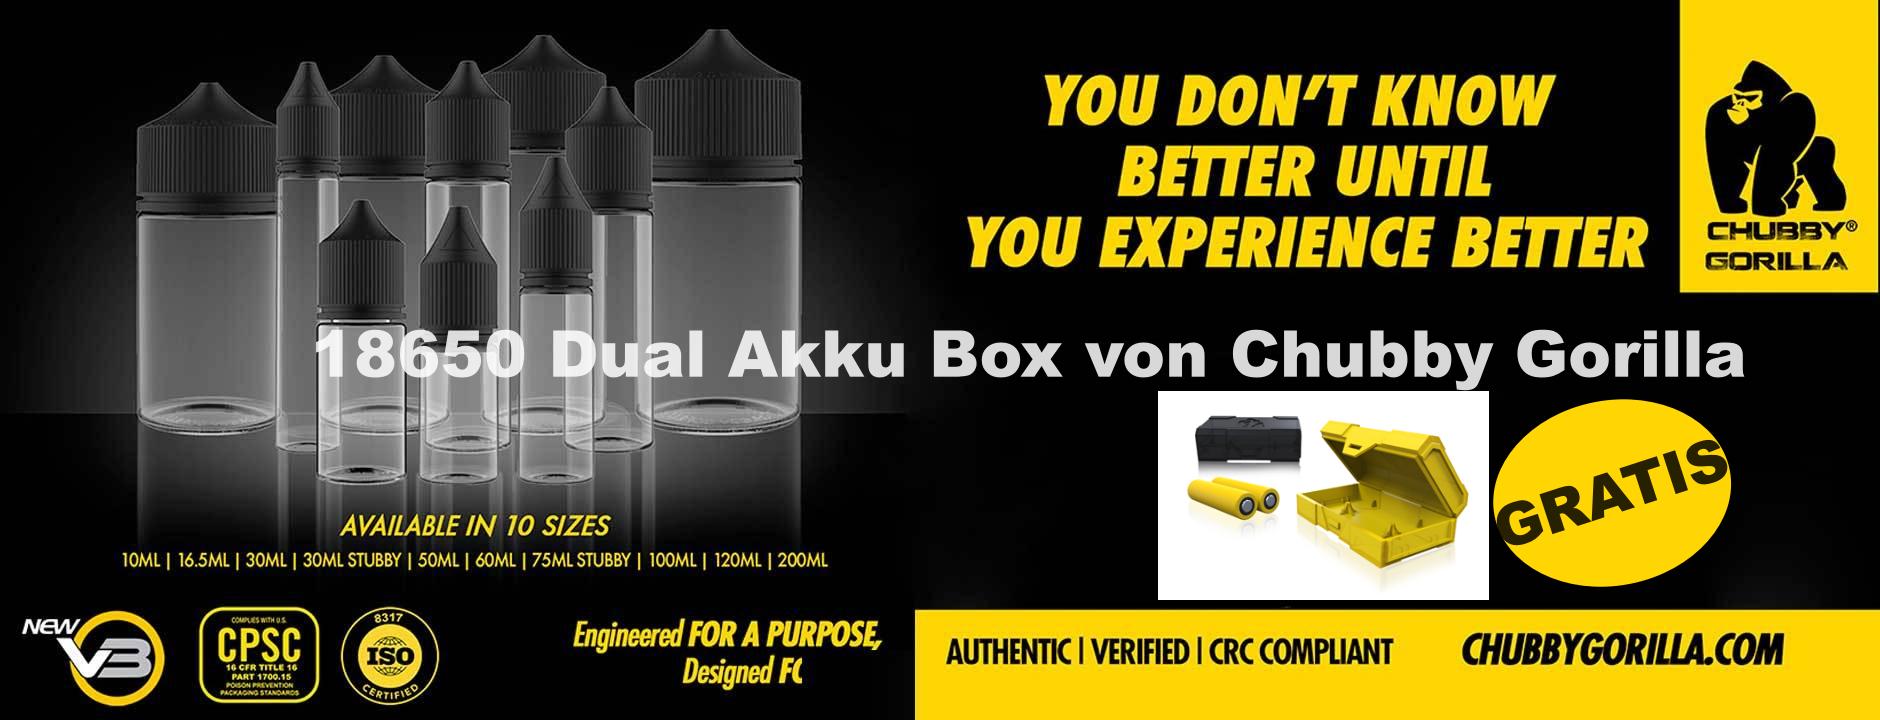 Chubby Dual Akku Box